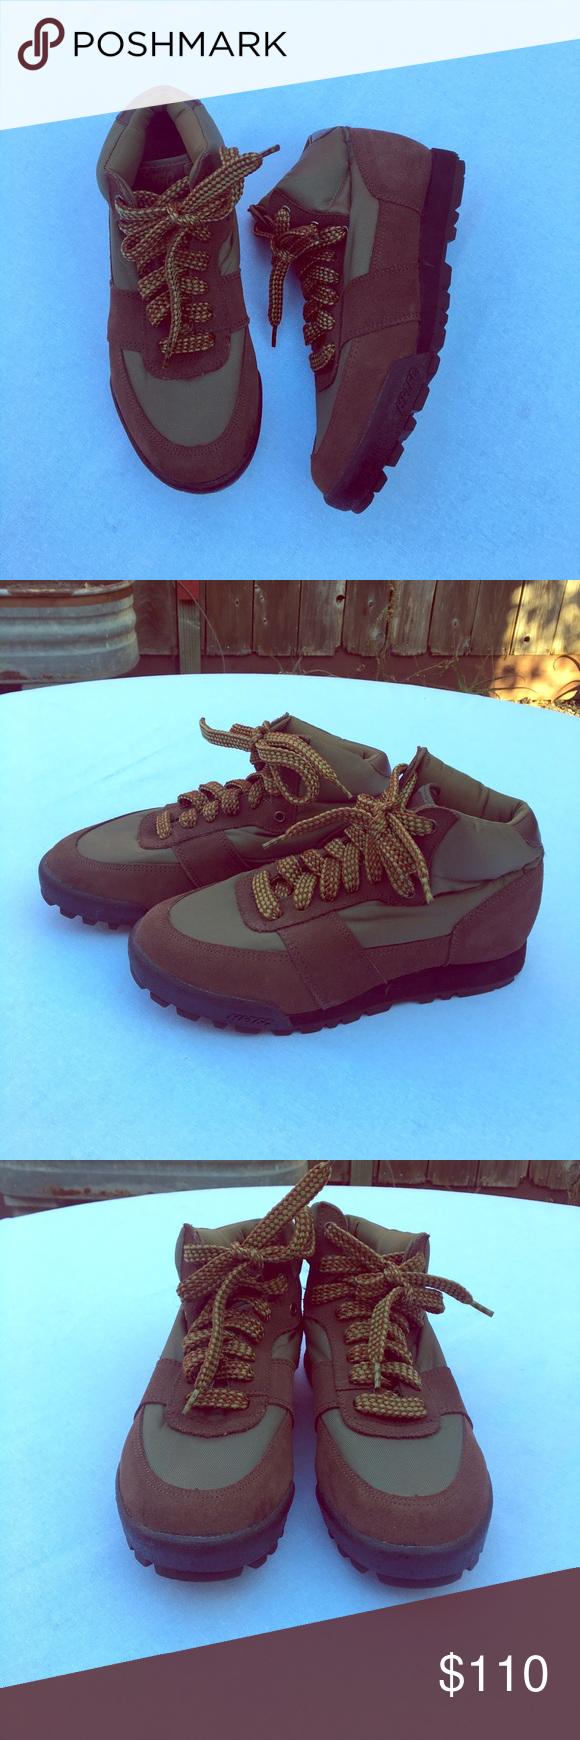 big selection promo code release date Dead stock 90's Hi-Tec Shasta Hiking Boots L9 Dead stock ...